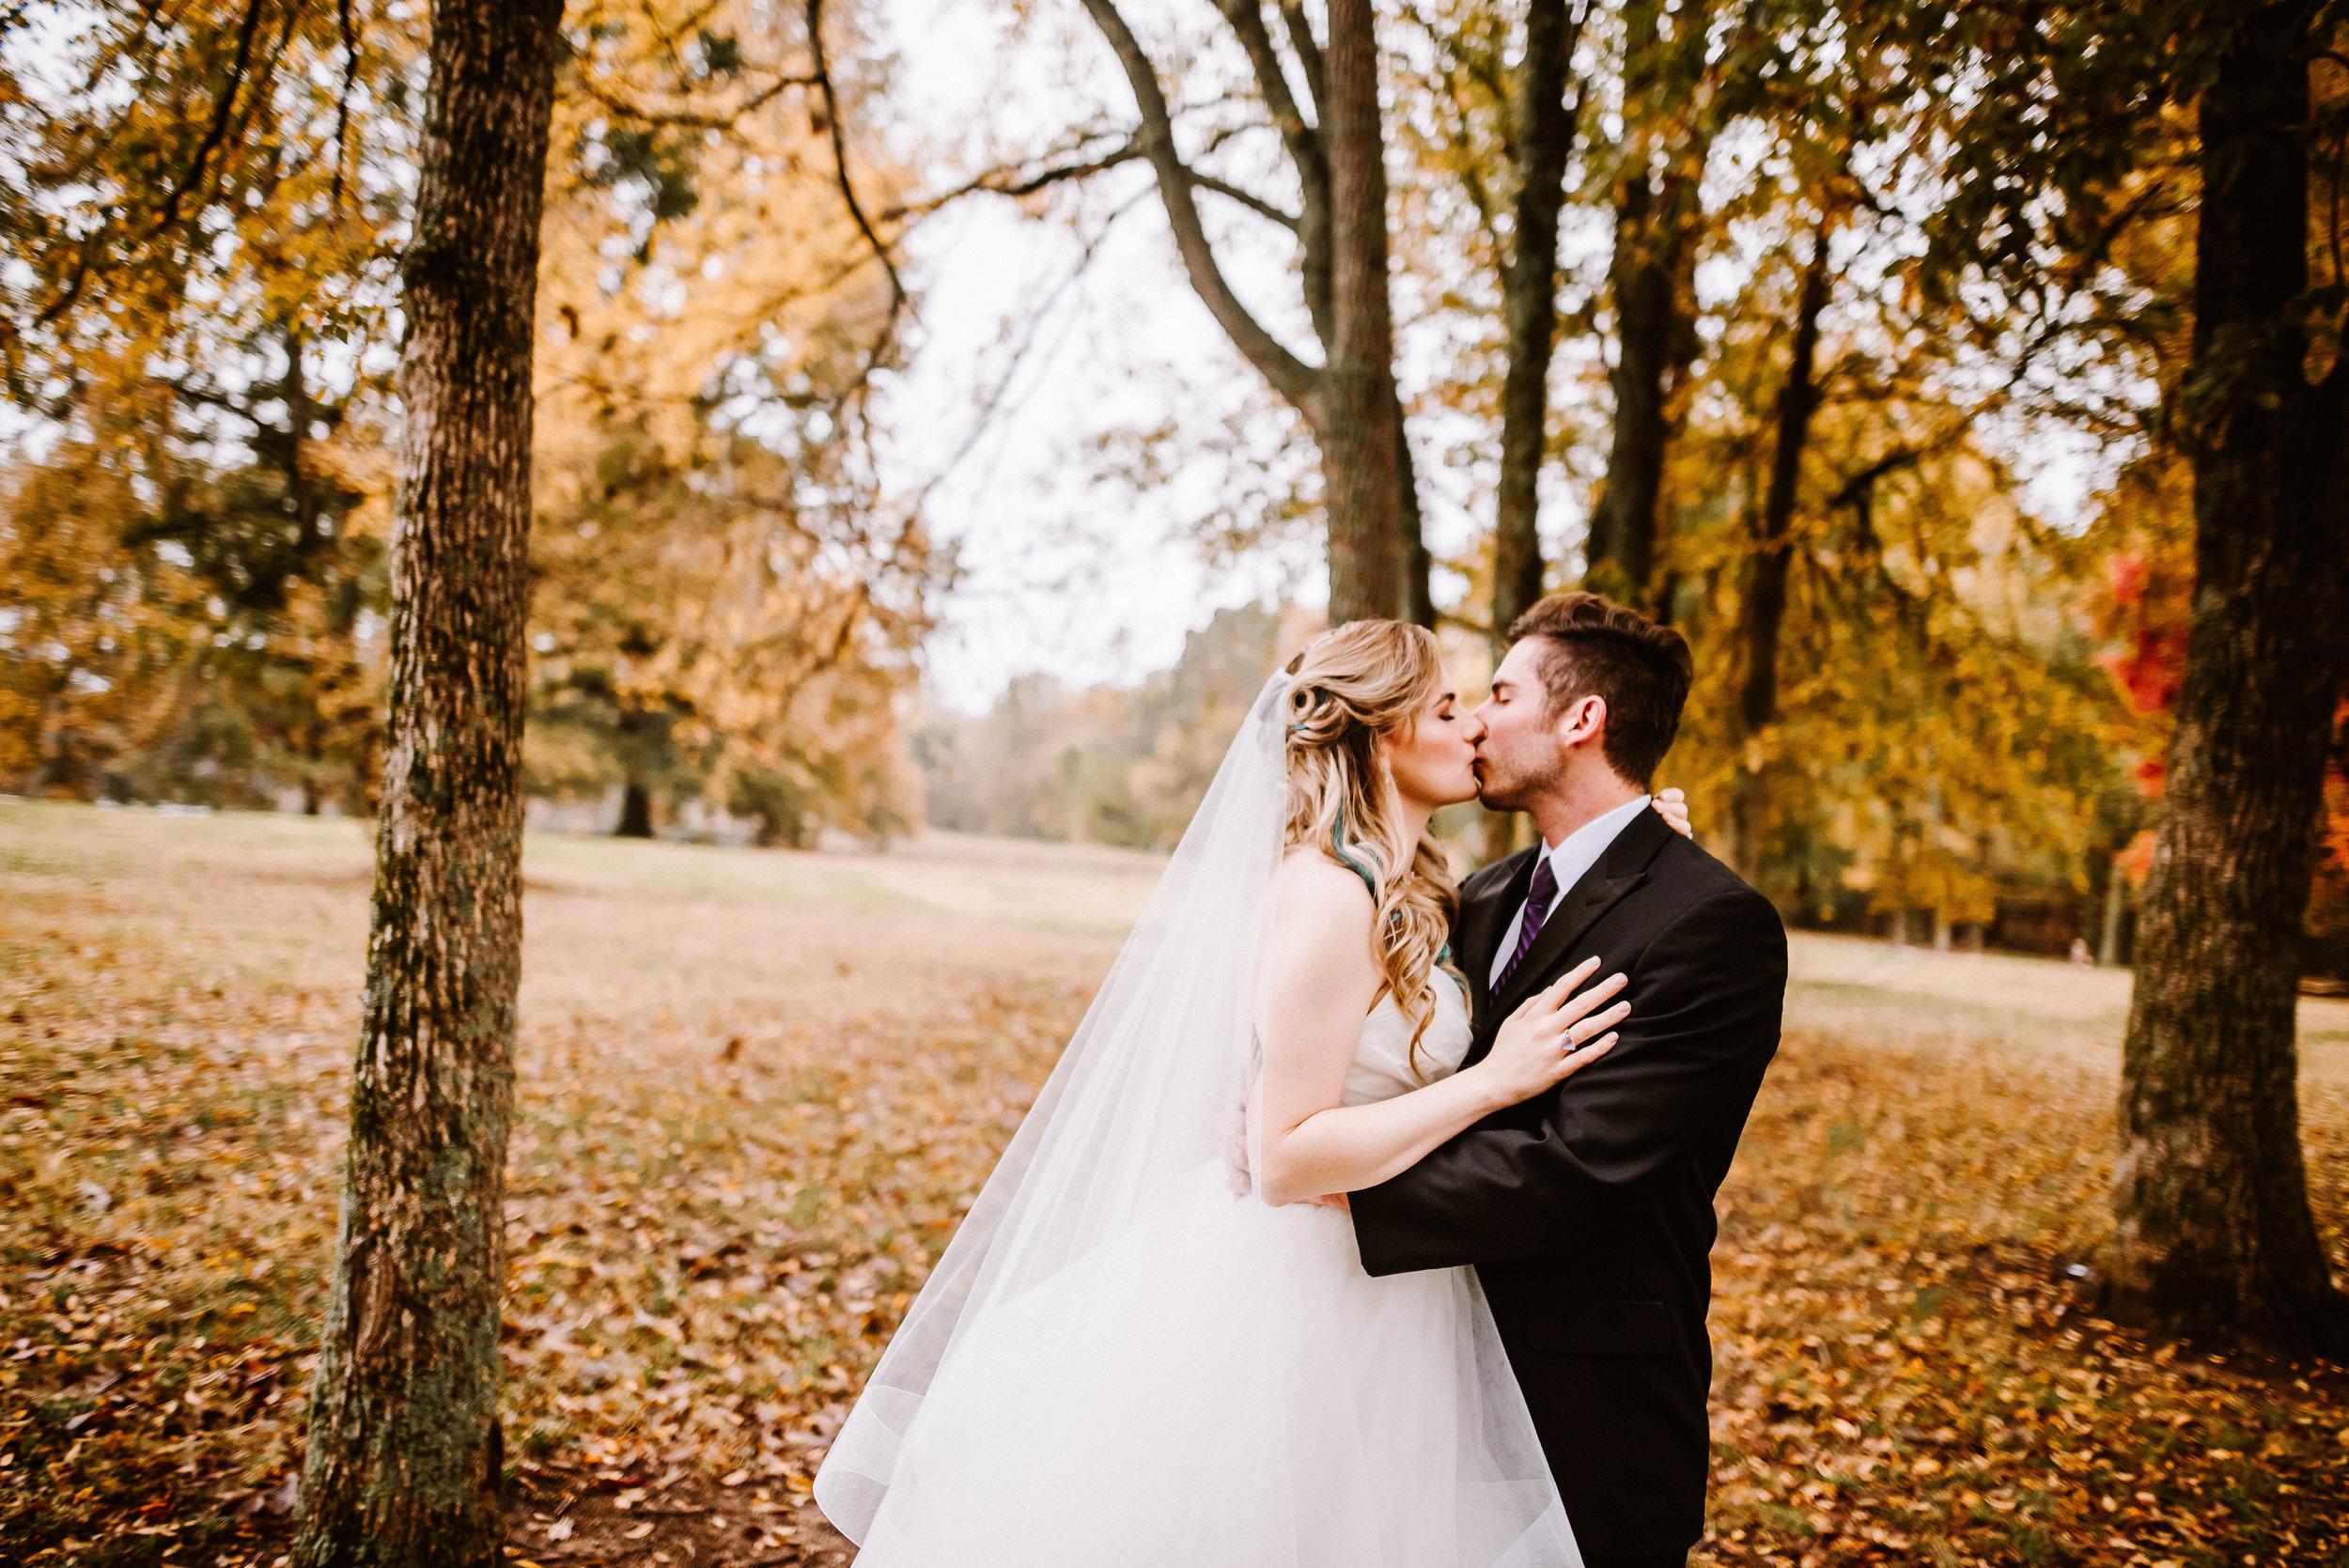 Lucchesi-Wedding_Shelby-Farms_Ashley-Benham-Photography-154.jpg